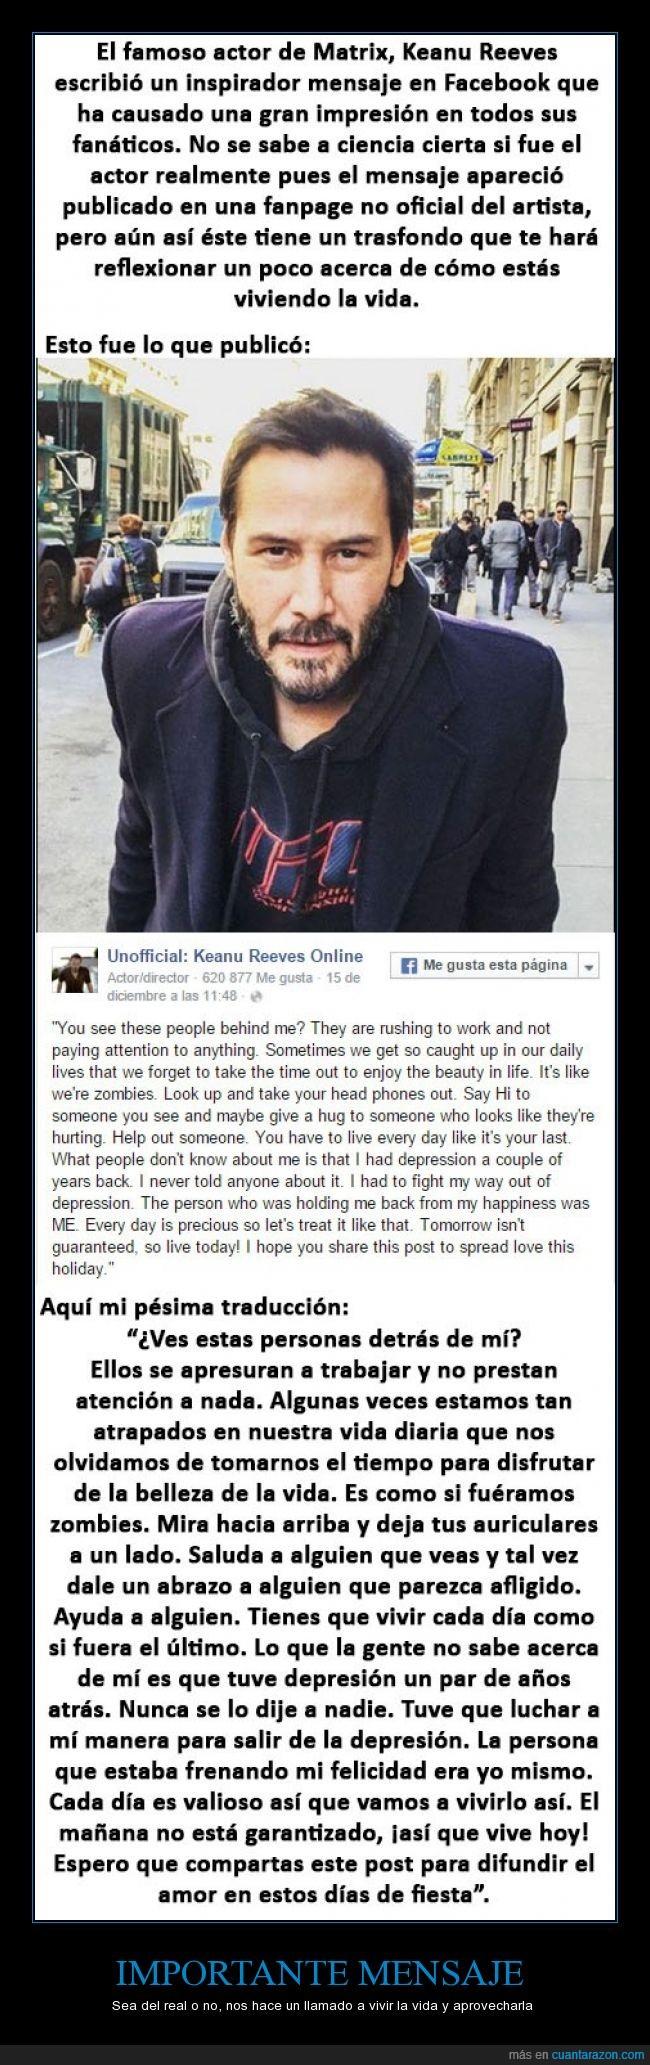 fan,importante,Keanu Reeves,mensaje,vida,vivir